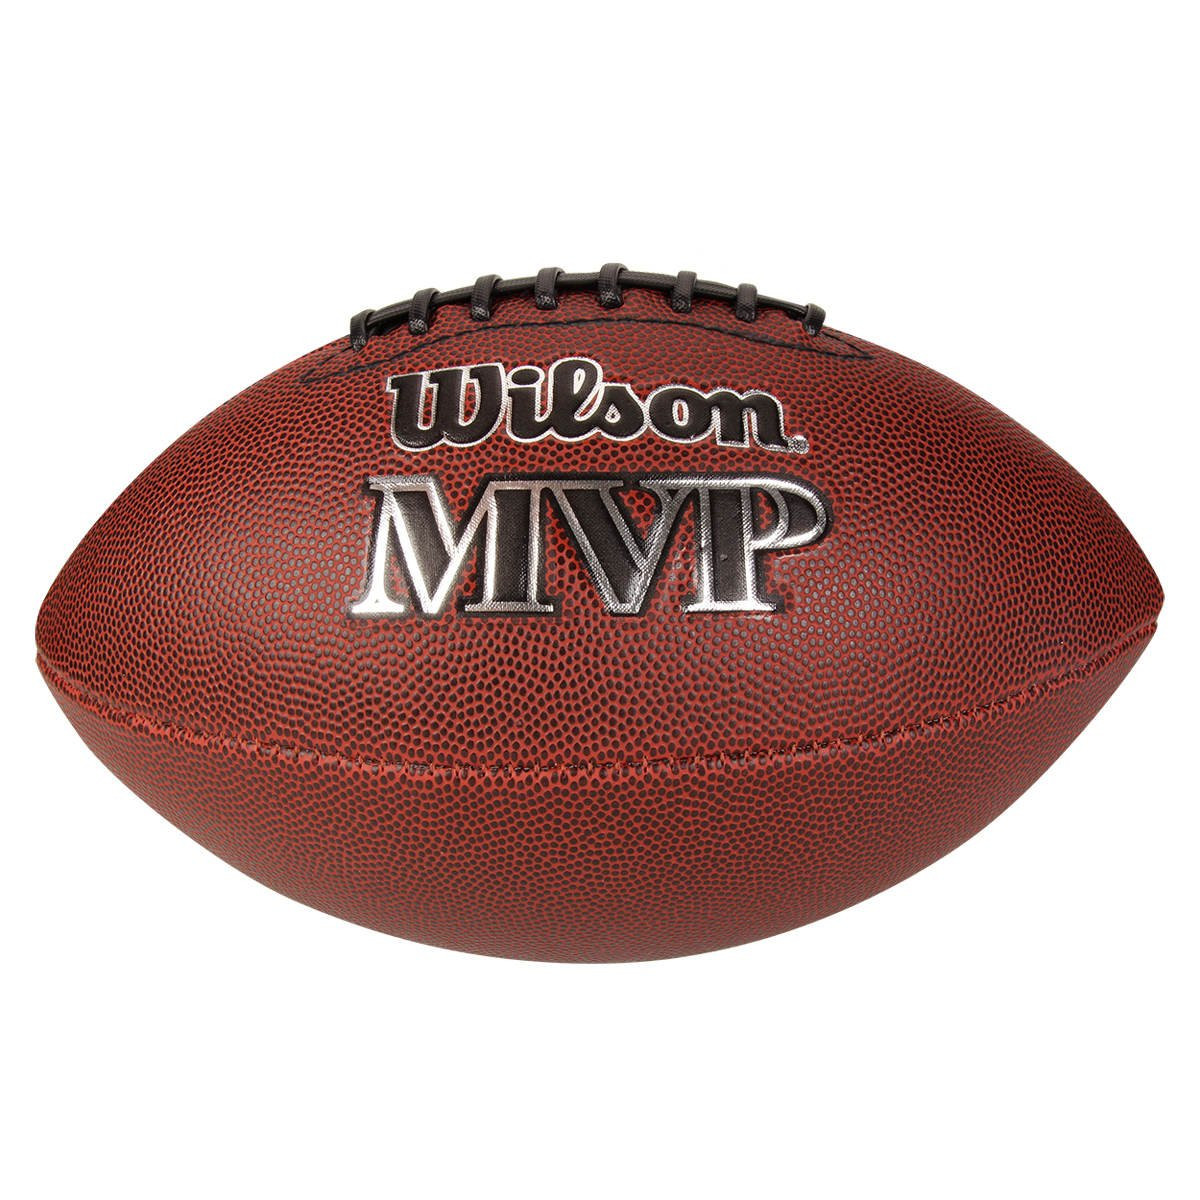 edcec6f60d Bola Wilson Futebol Americano MVP